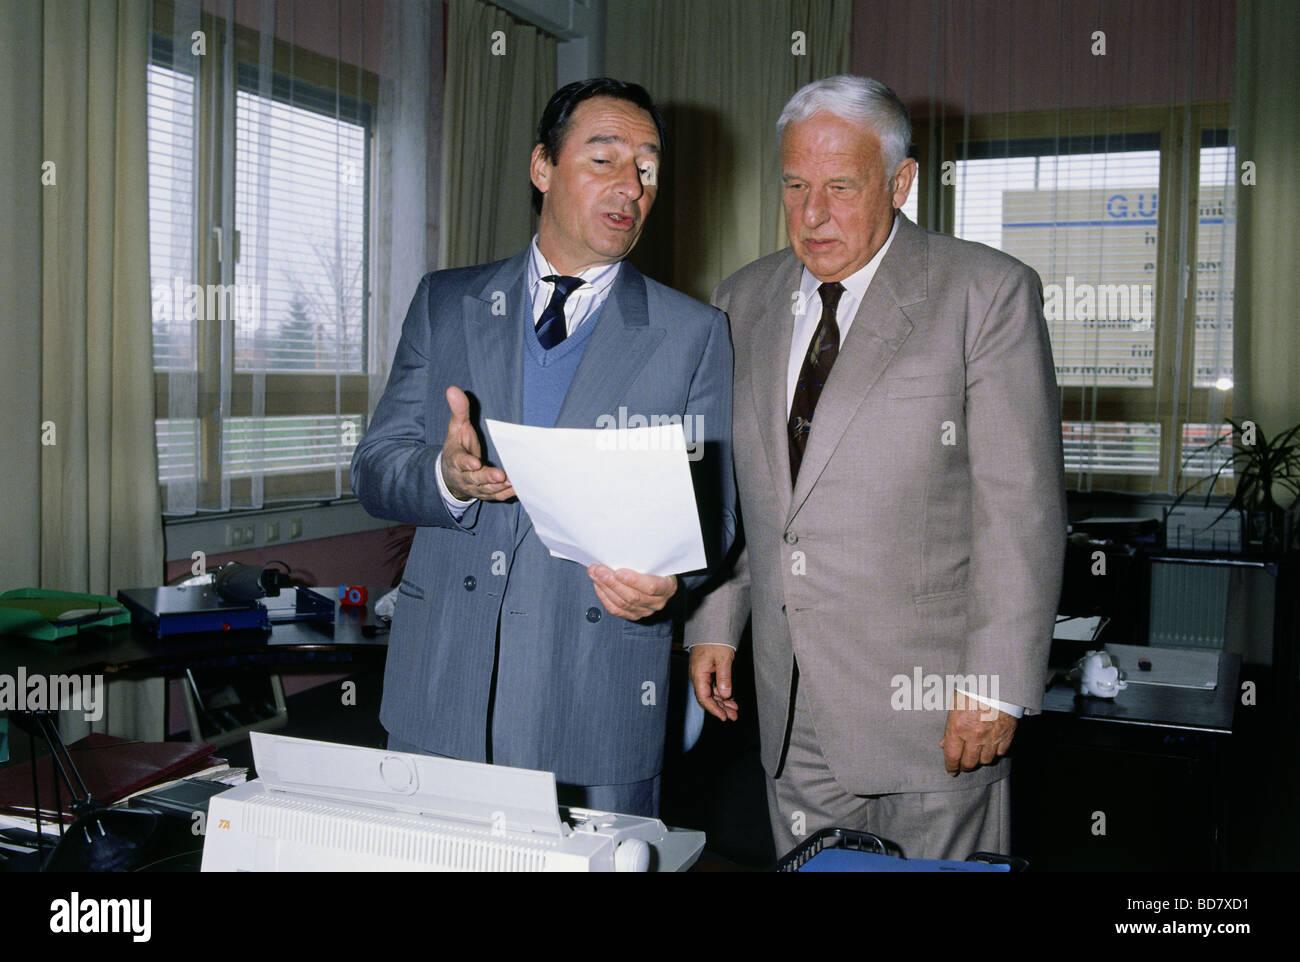 Tv Serie Buro Buro Deu 1982 1993 1989 2 Staffel Folge 63